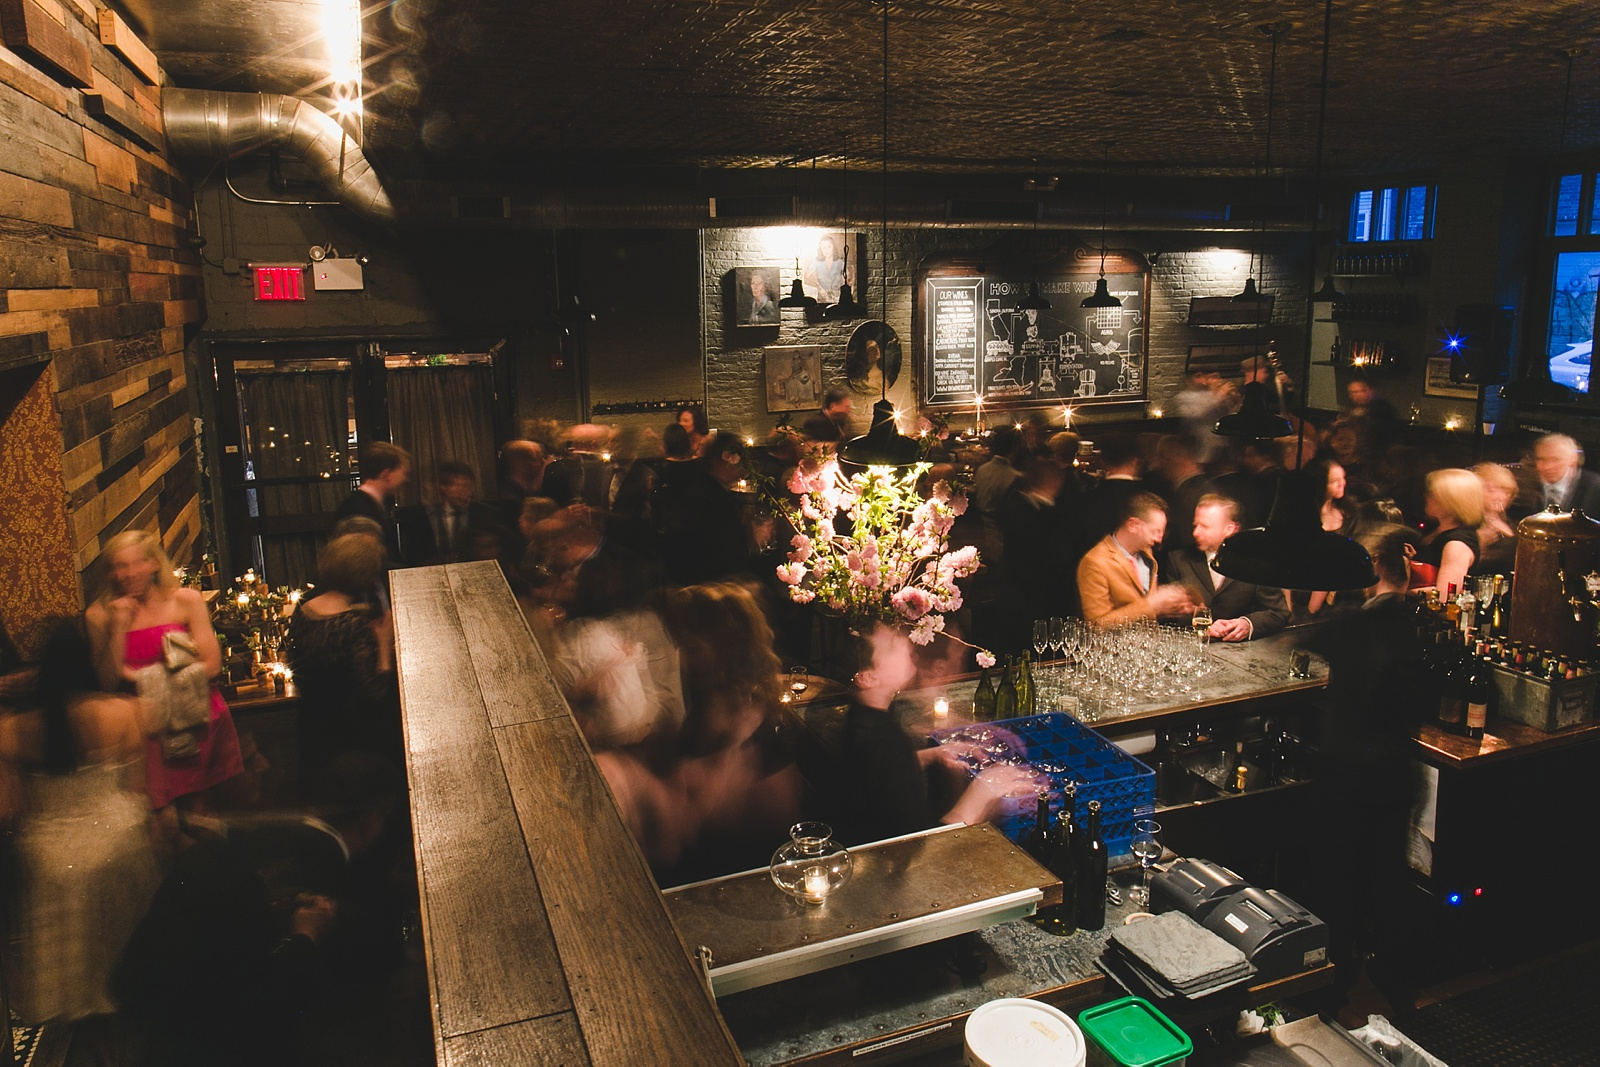 Brooklyn_Winery_Join.jpg